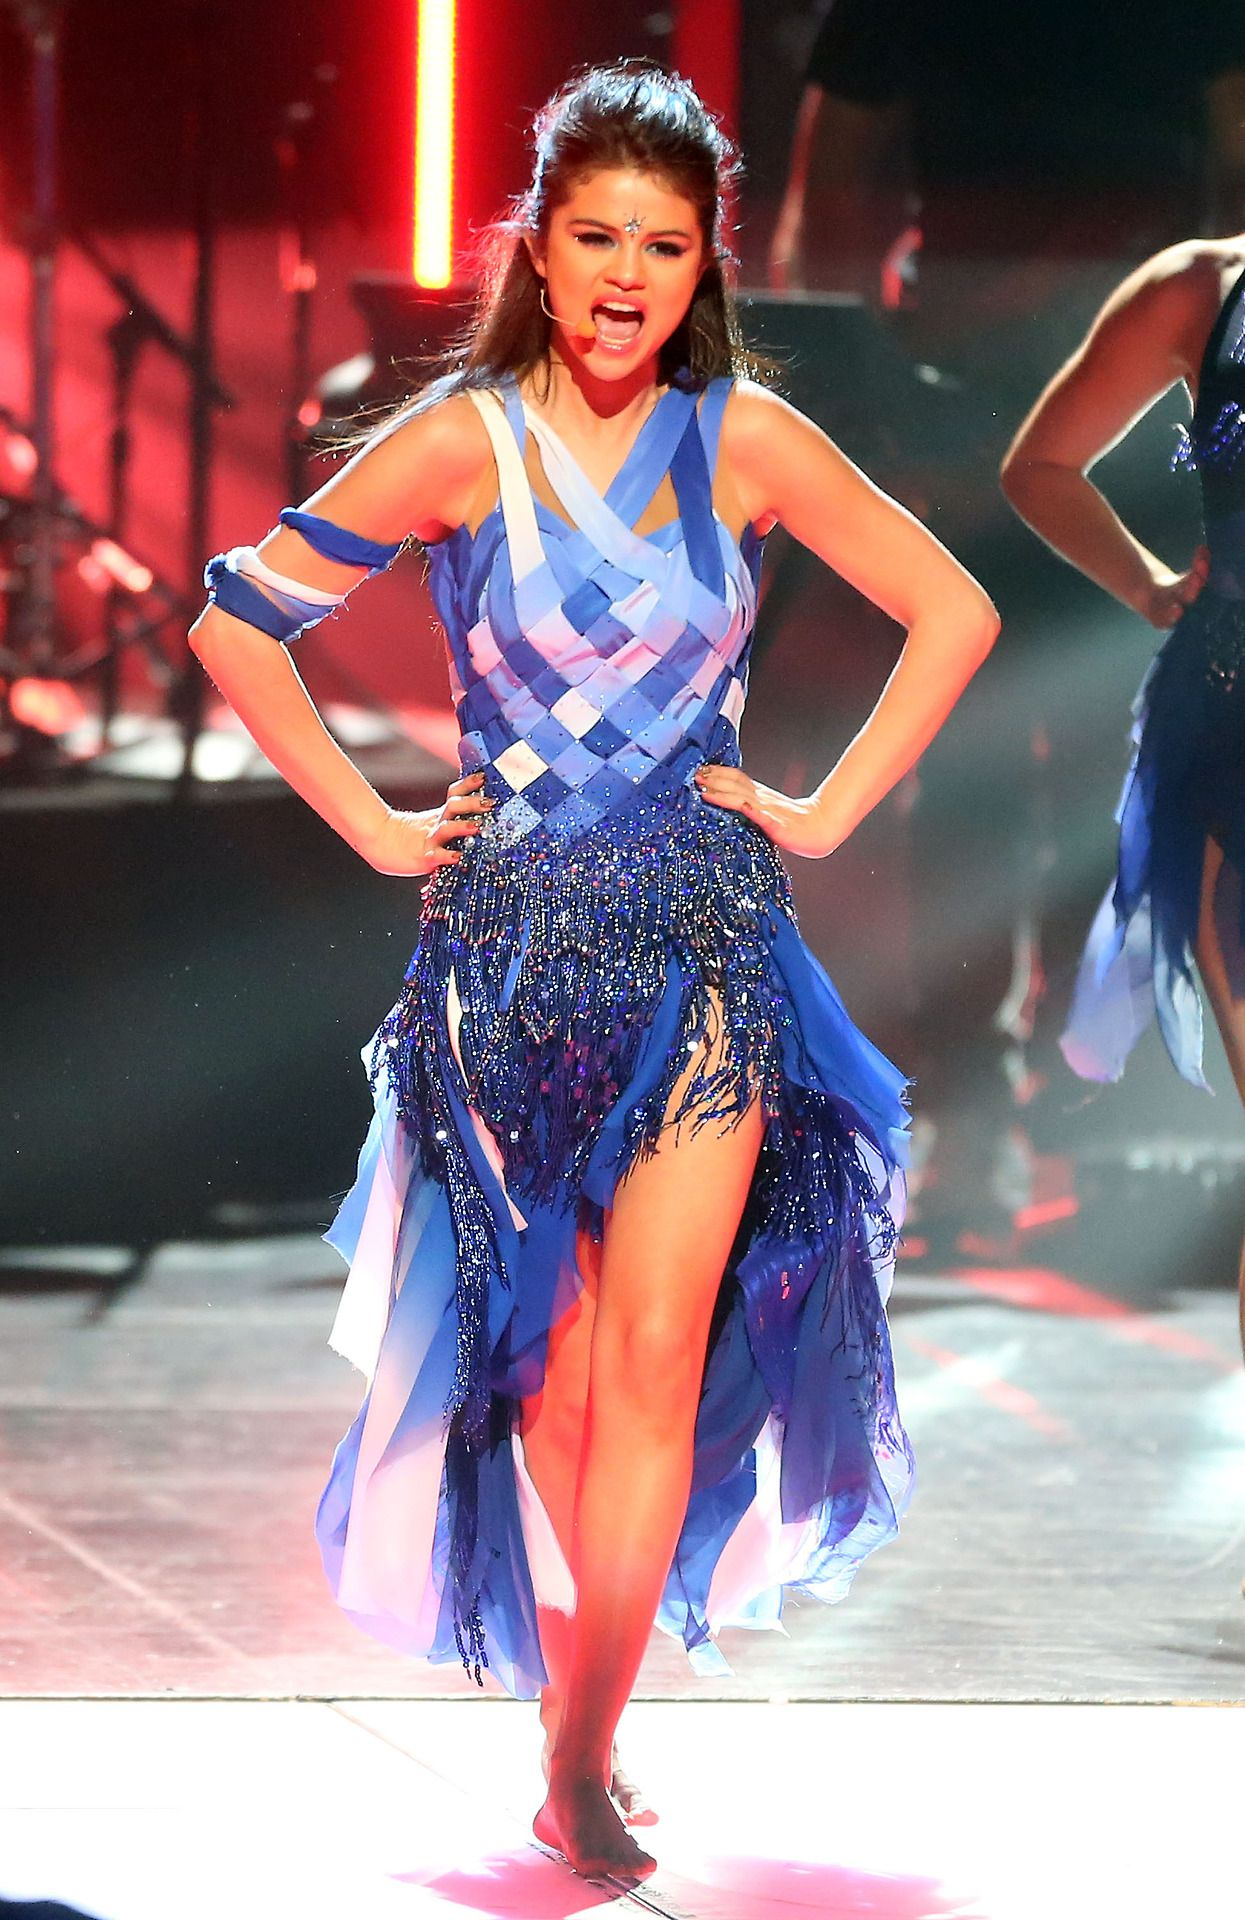 Selena Gomez wears a fun, blue, tribal dress performing ...